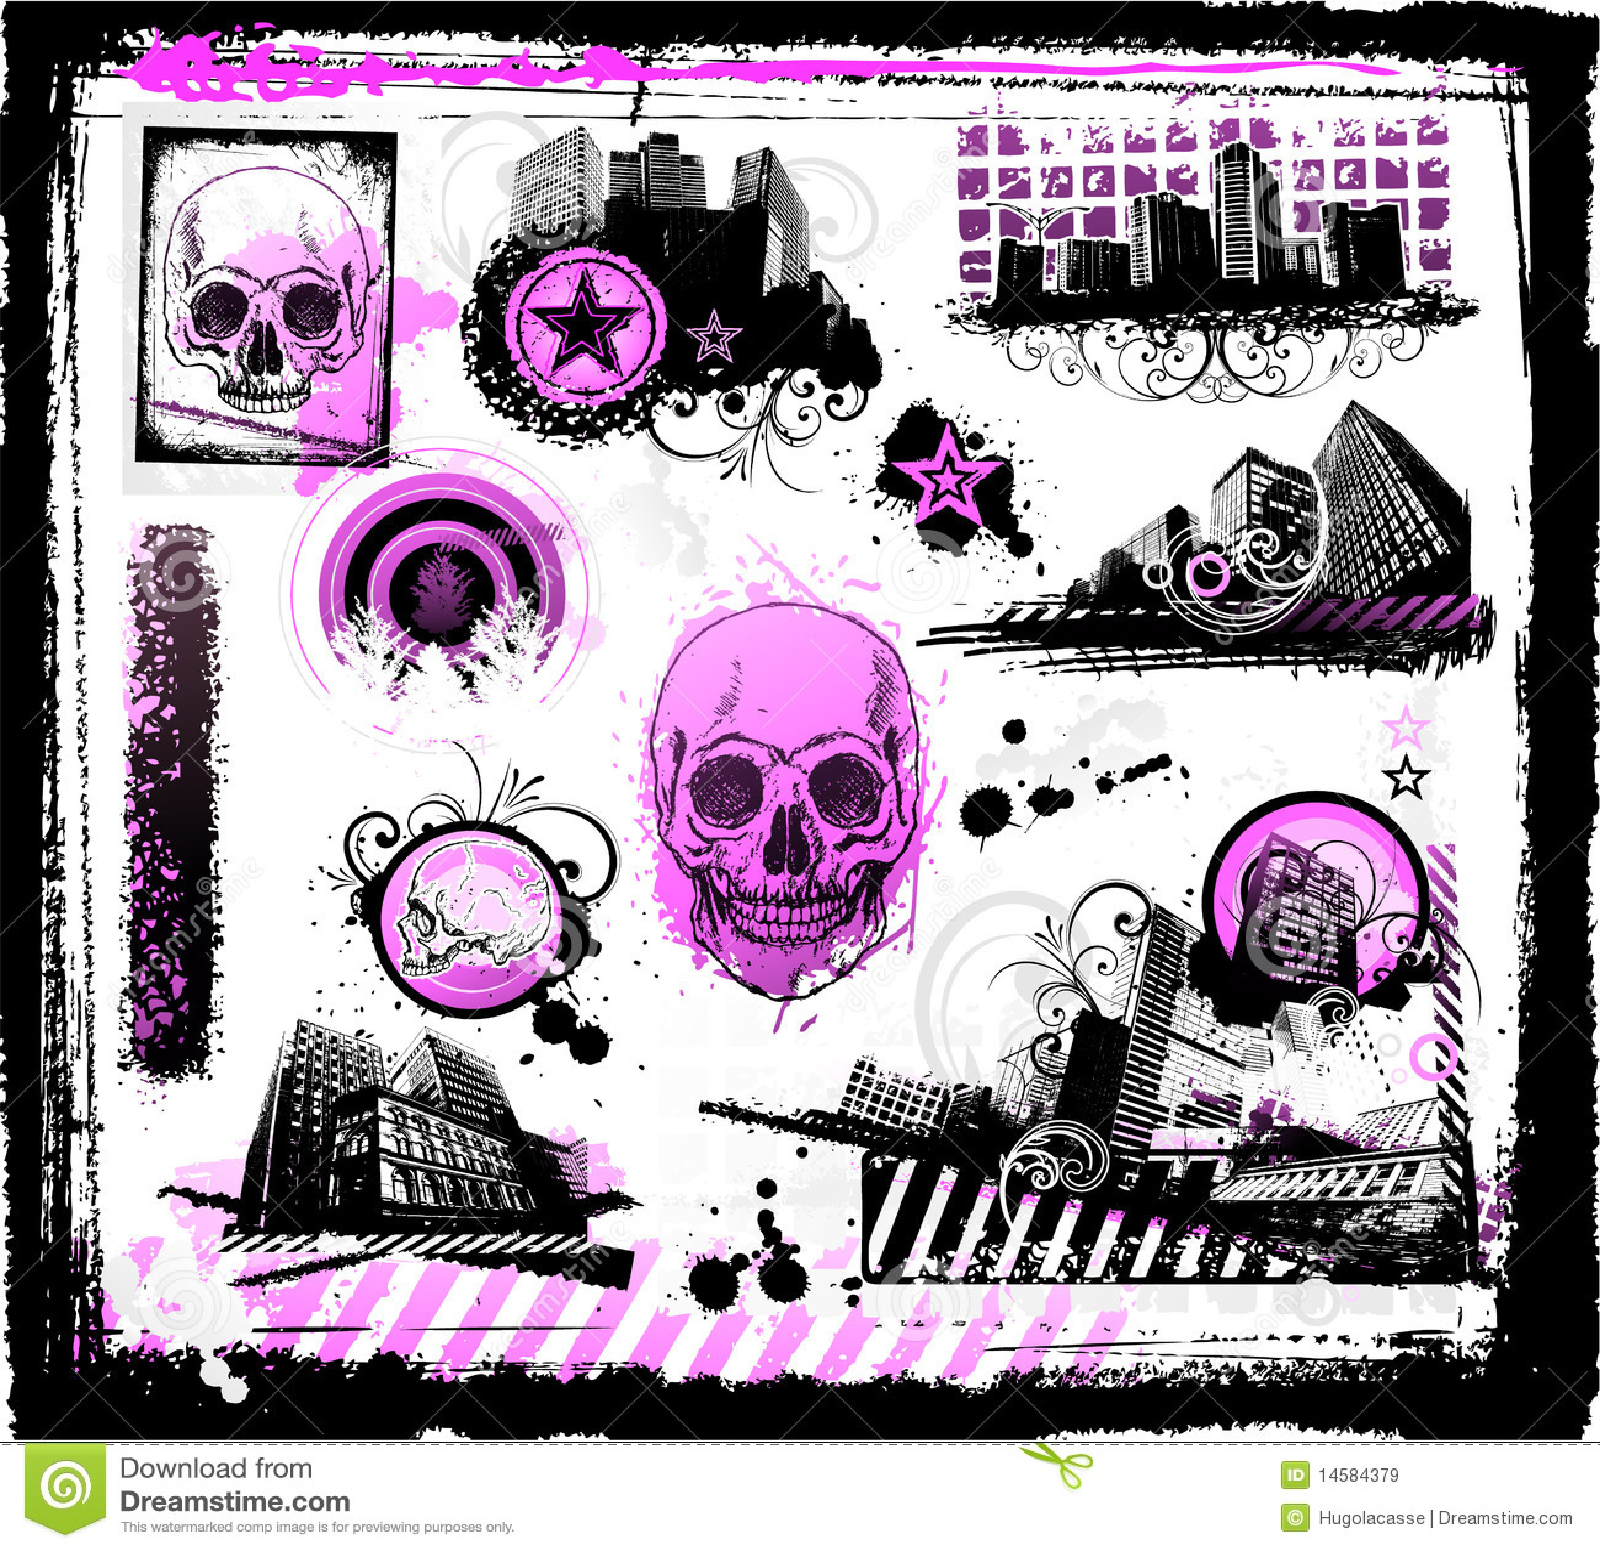 Grunge Emo Design Royalty Free Stock Images